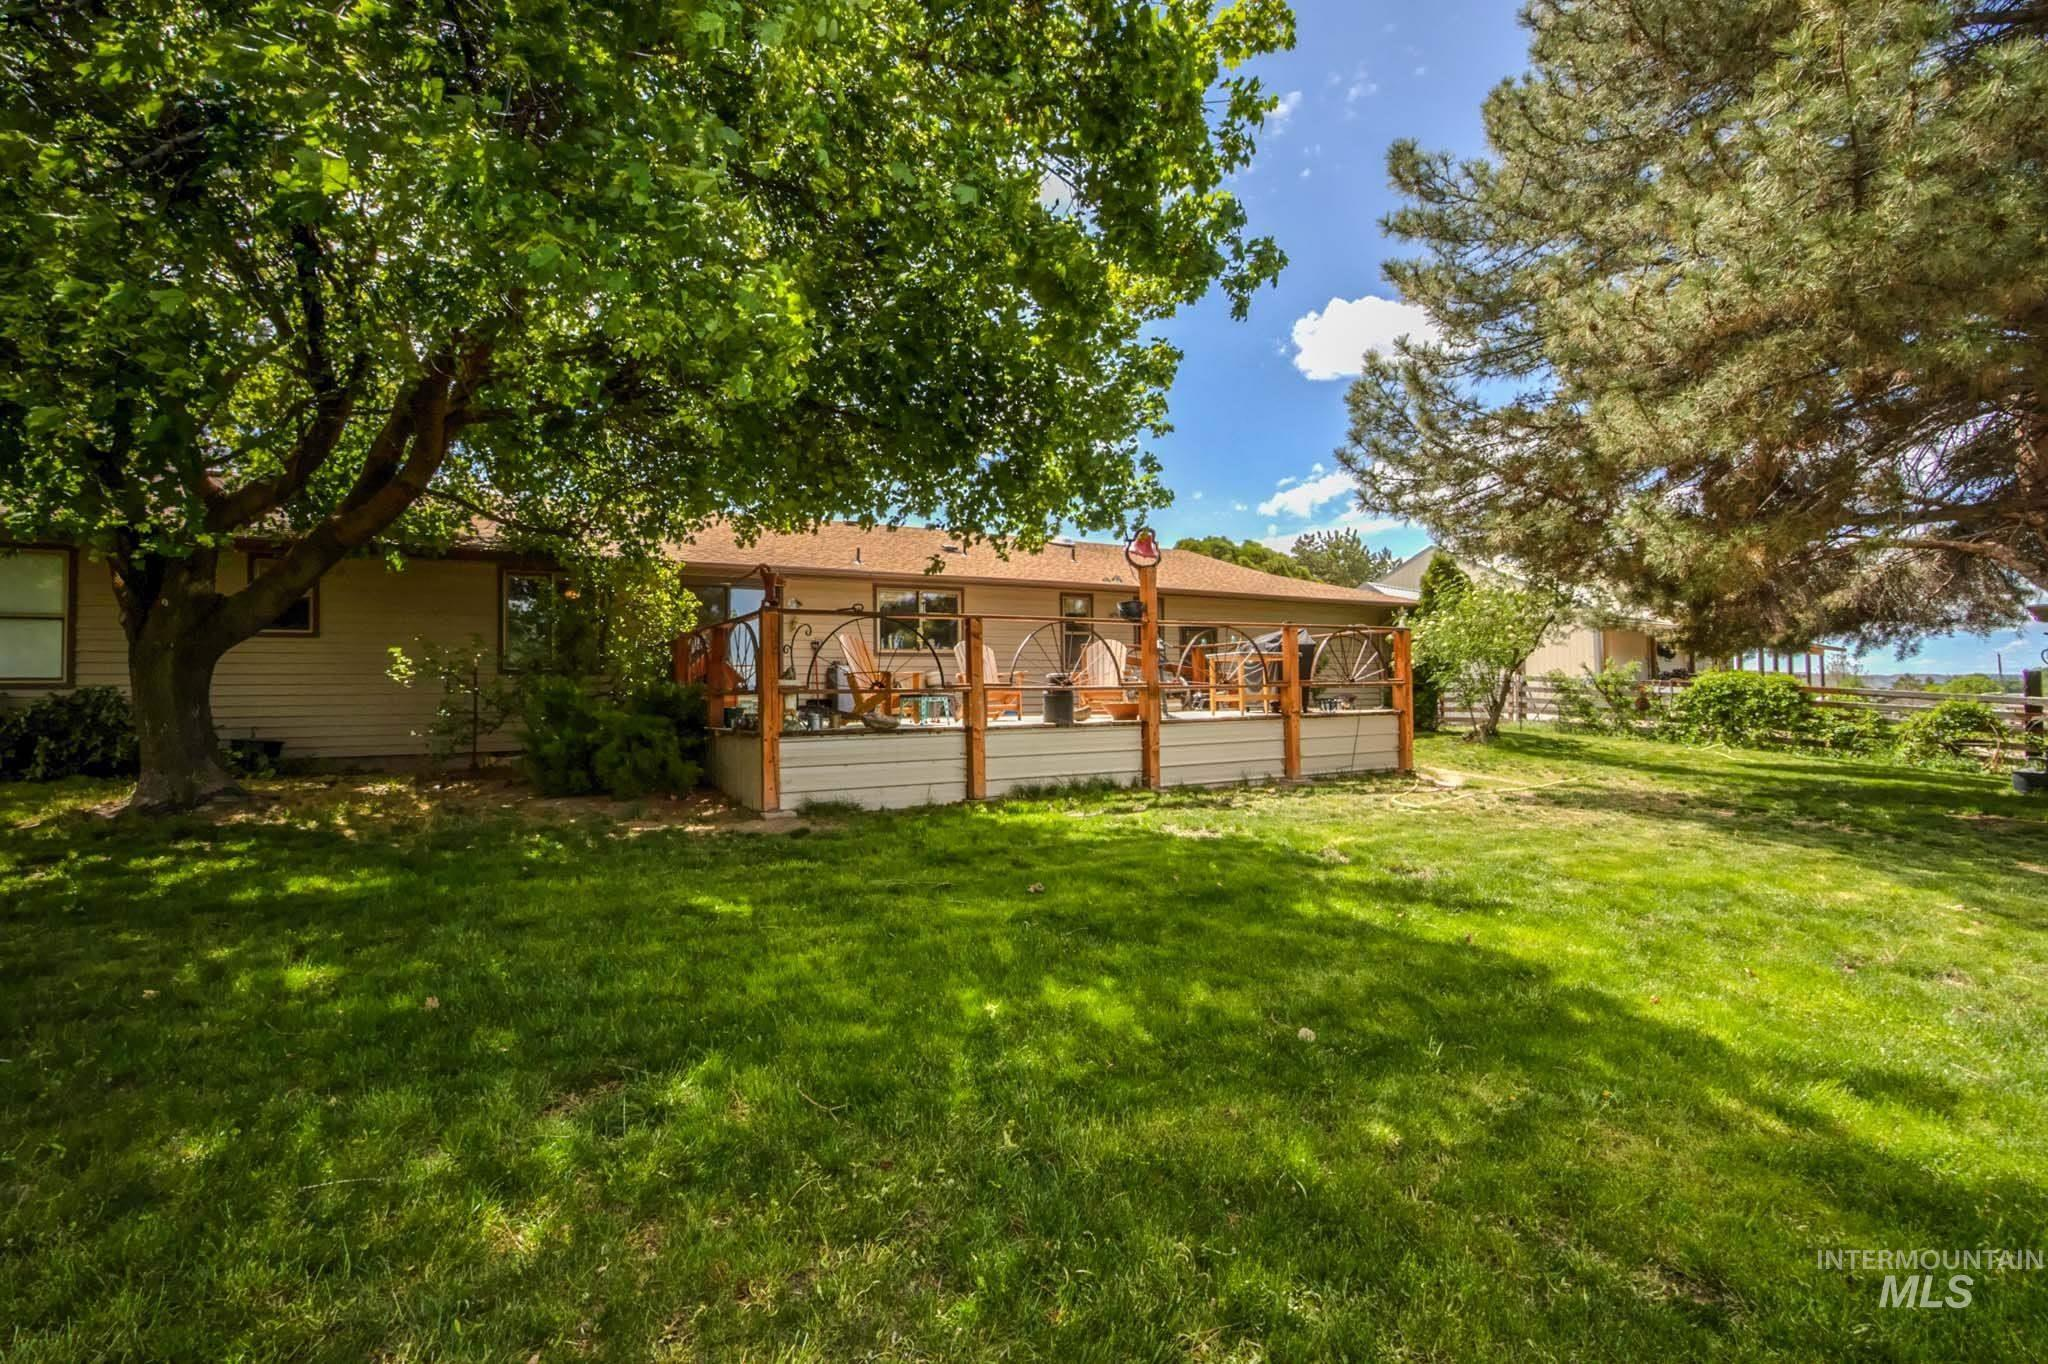 3700 Wills Rd Property Photo - Emmett, ID real estate listing